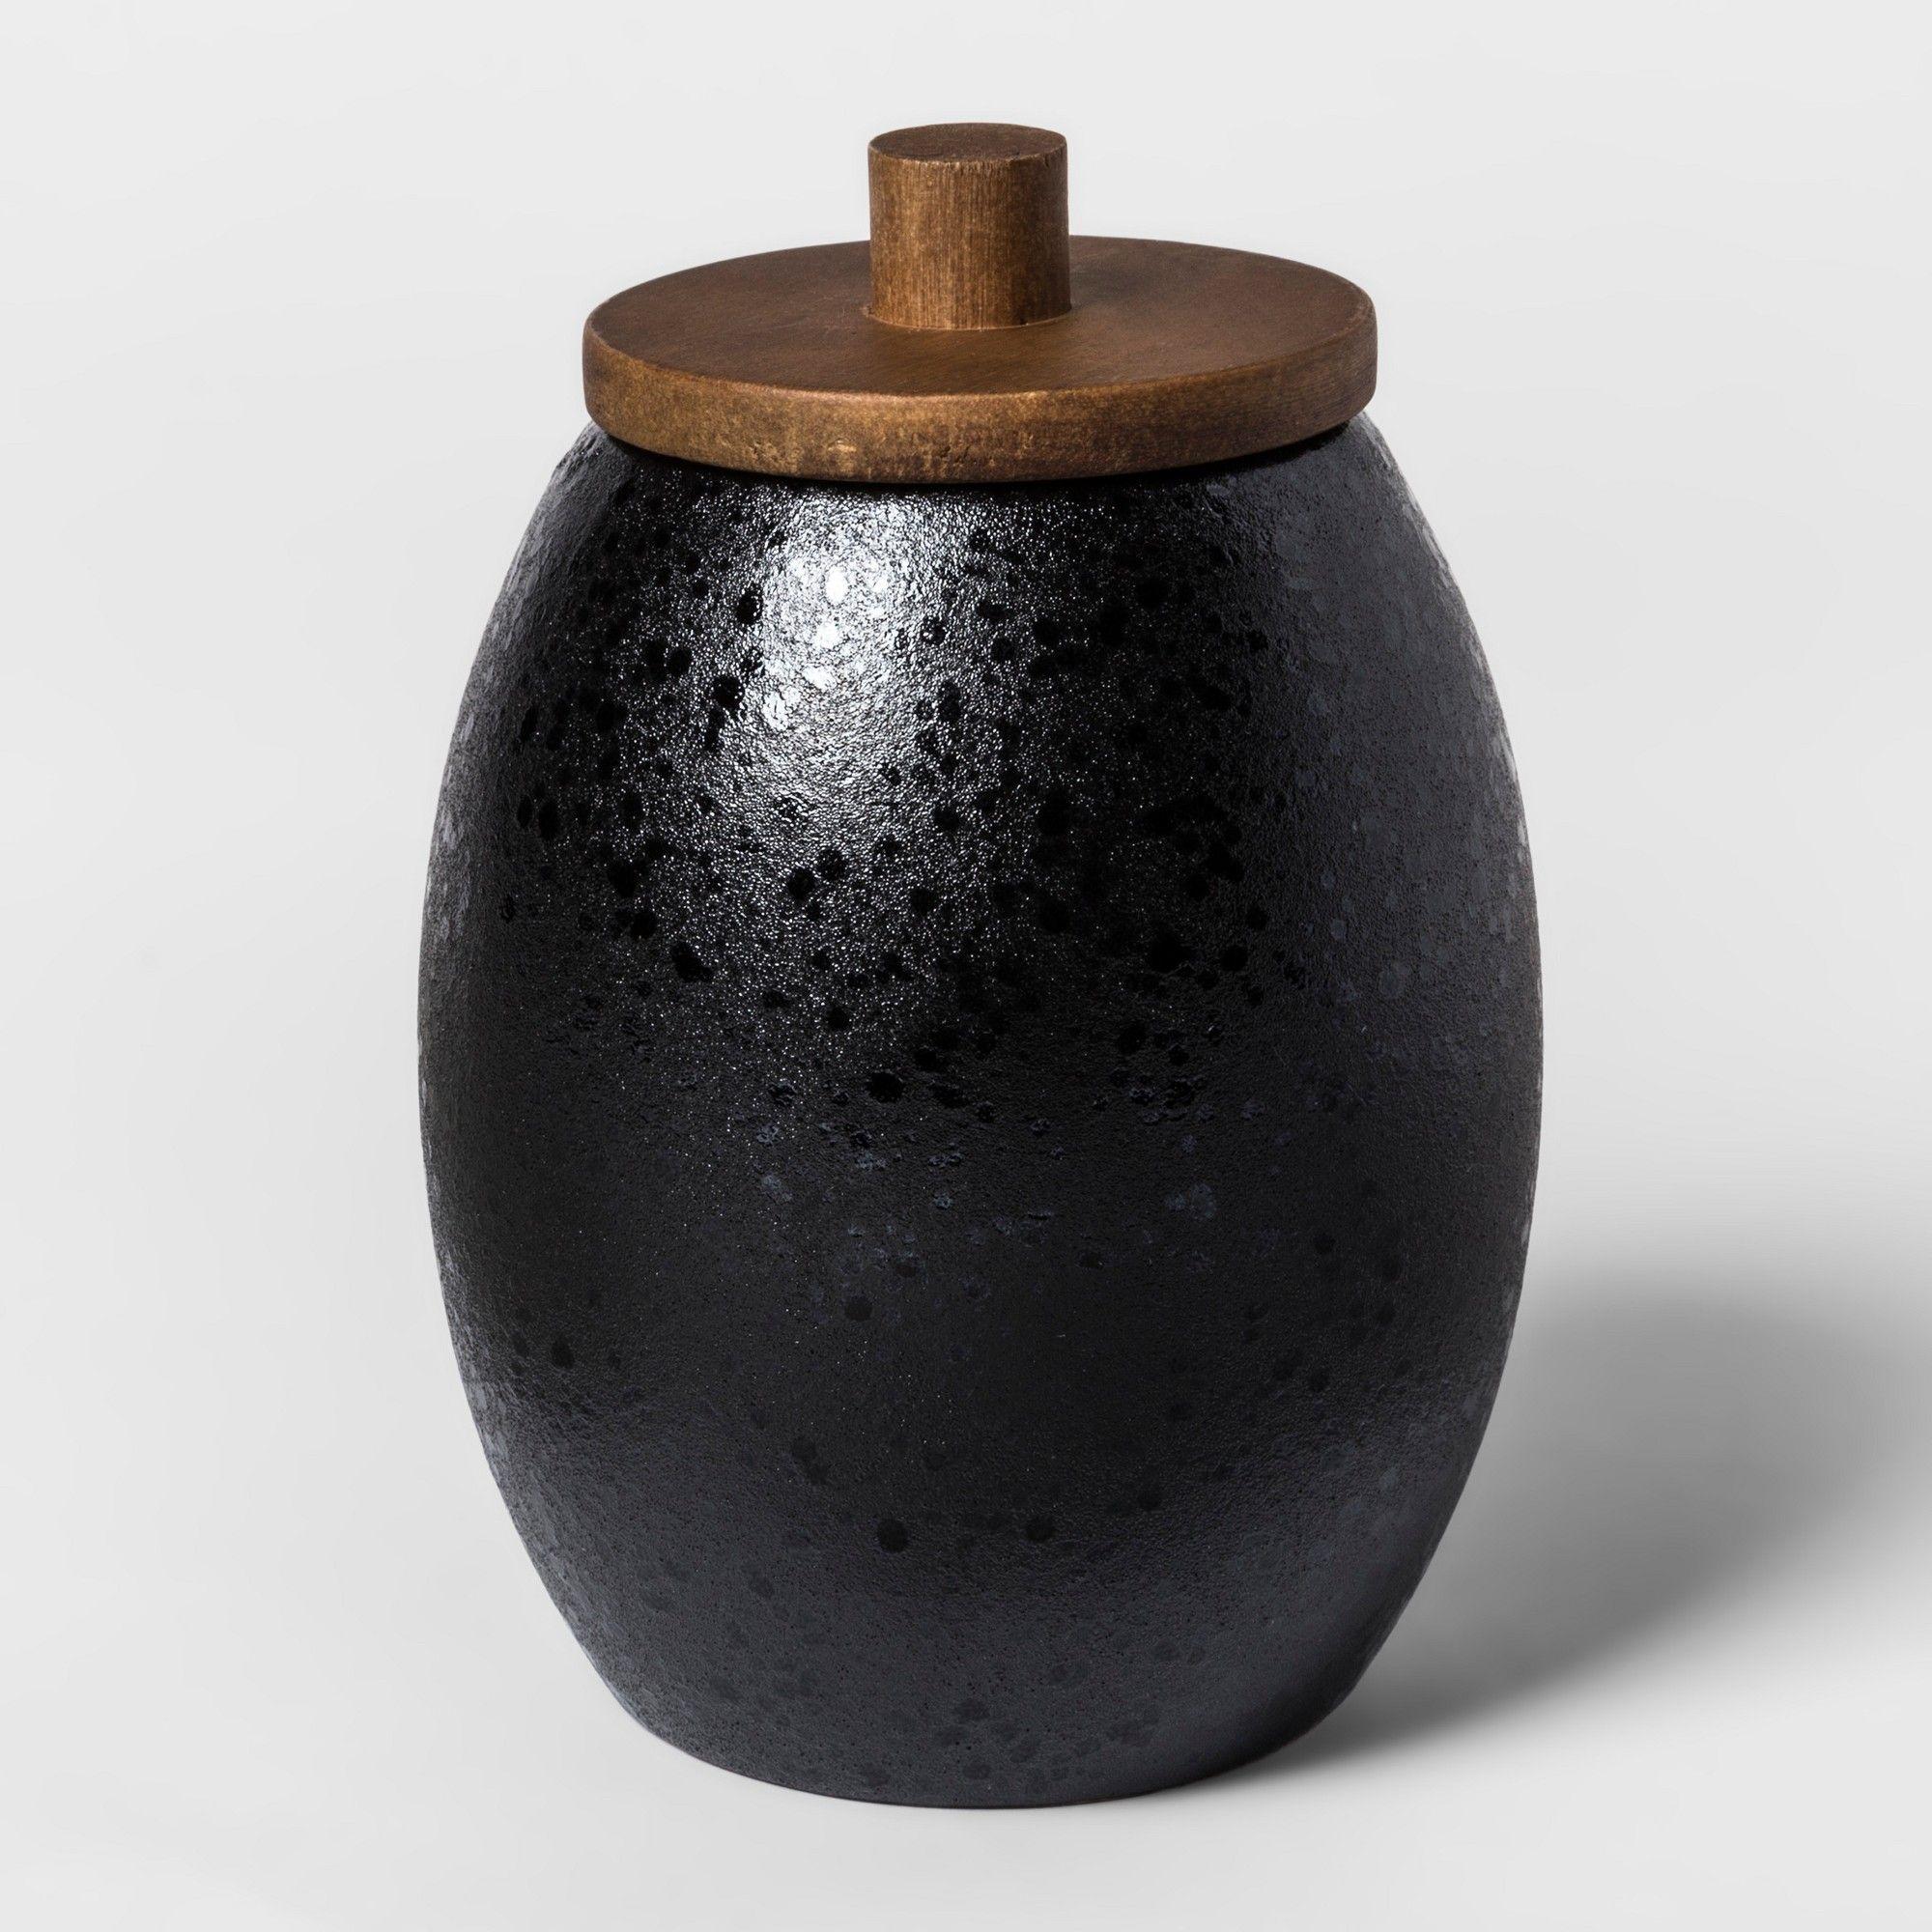 Decorative Container - Black - Project 62 | Decorative ...